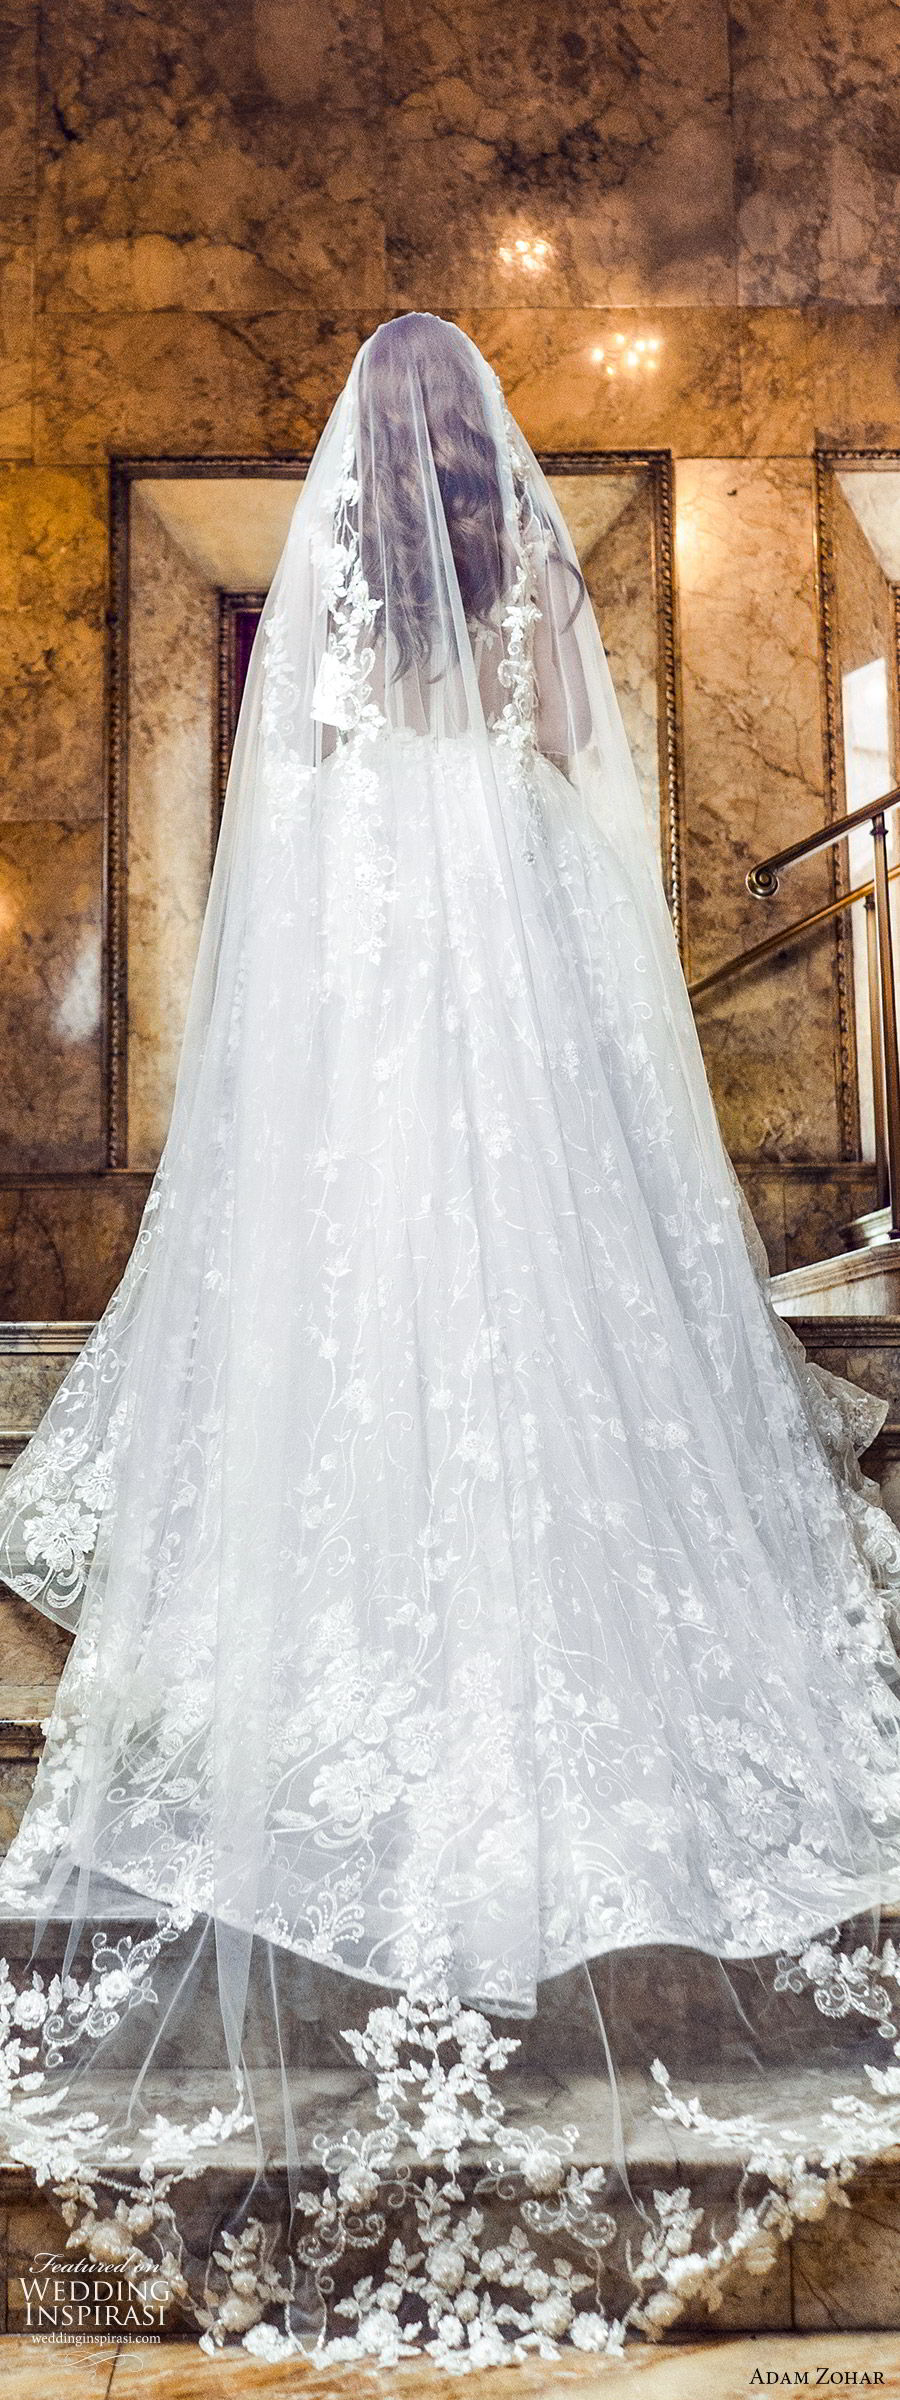 adam zohar 2020 bridal sleeveless sheer straps sweetheart fully embellished lace a line ball gown wedding dress (9) romantic princess chapel train veil bv